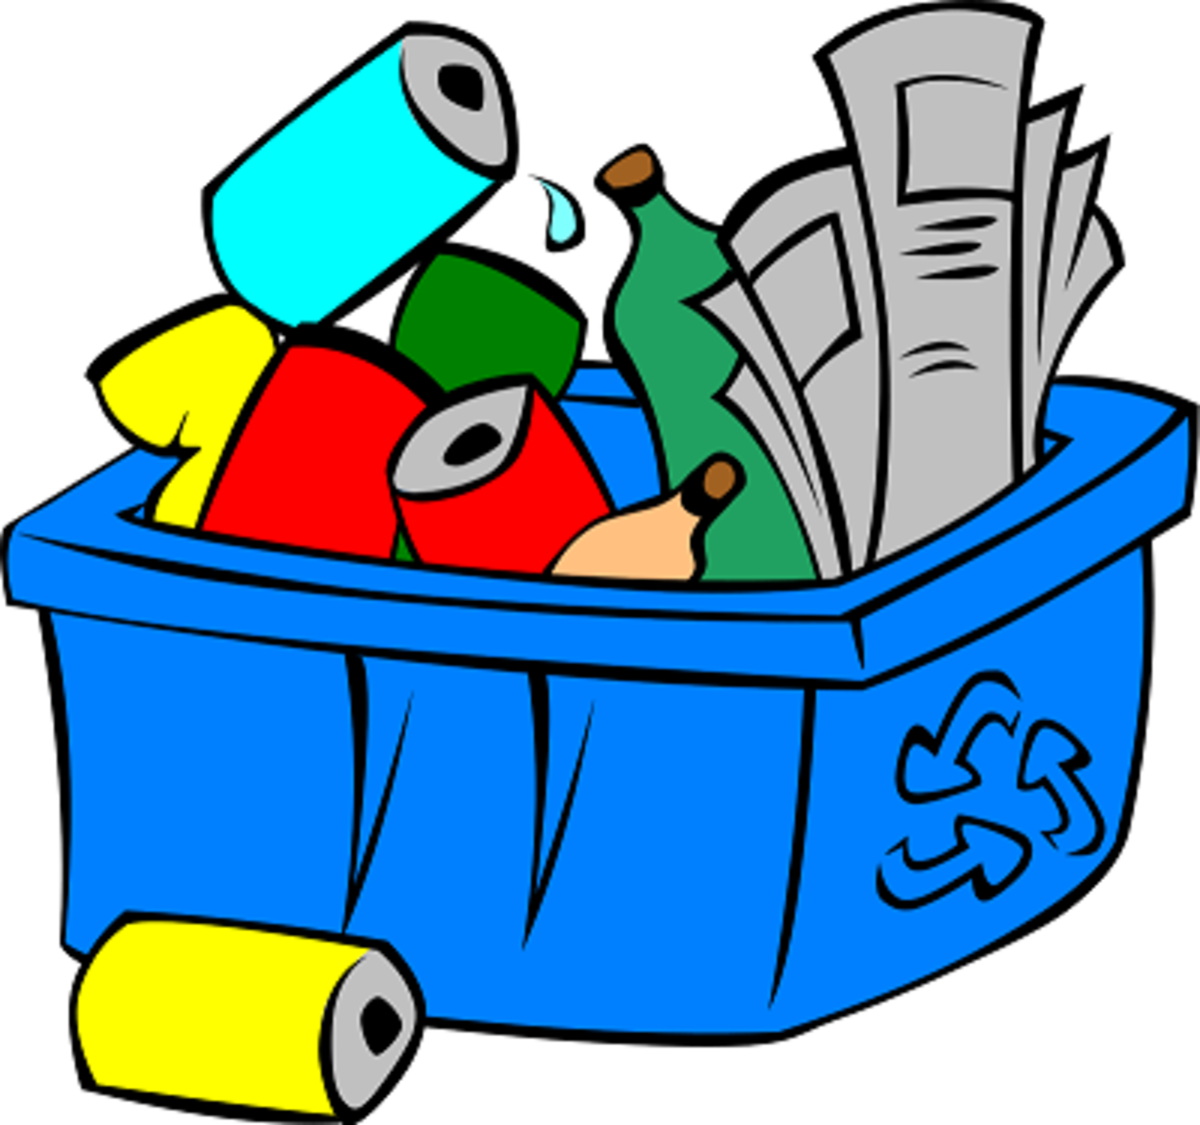 Recycle Bin Earth Day Clip Art